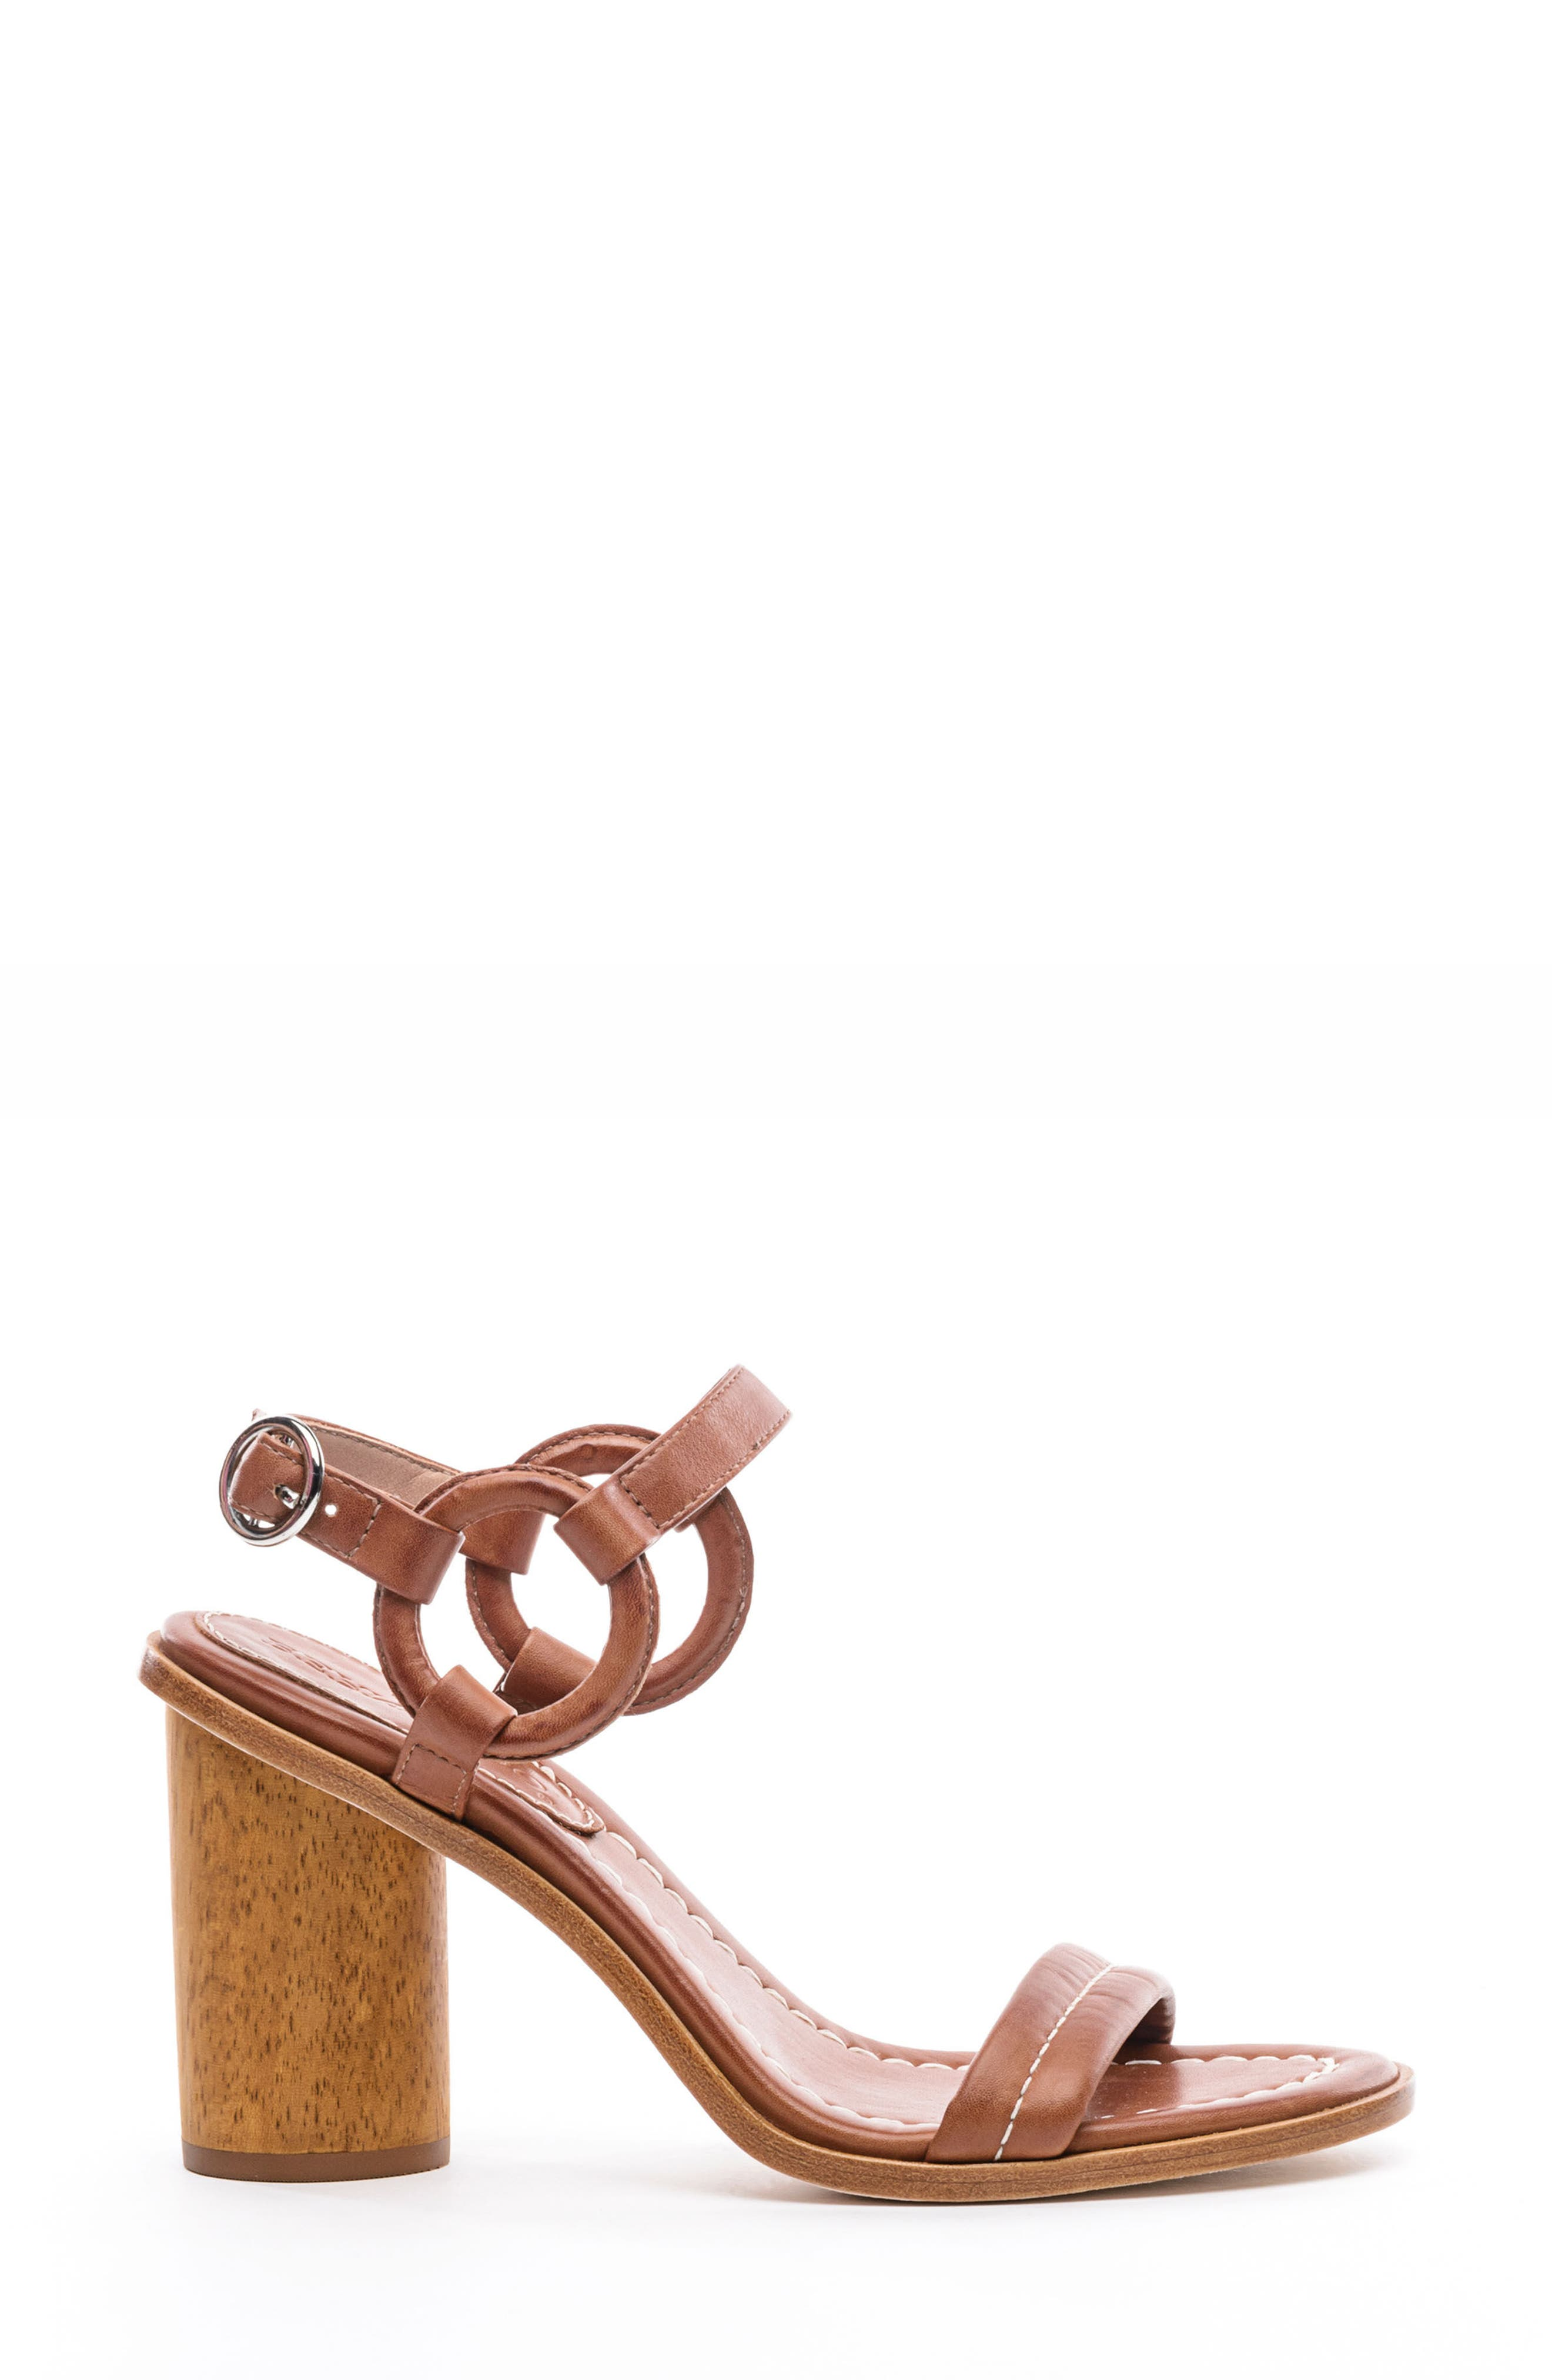 Bernardo Harlow Ankle Strap Sandal,                             Alternate thumbnail 3, color,                             Luggage Leather